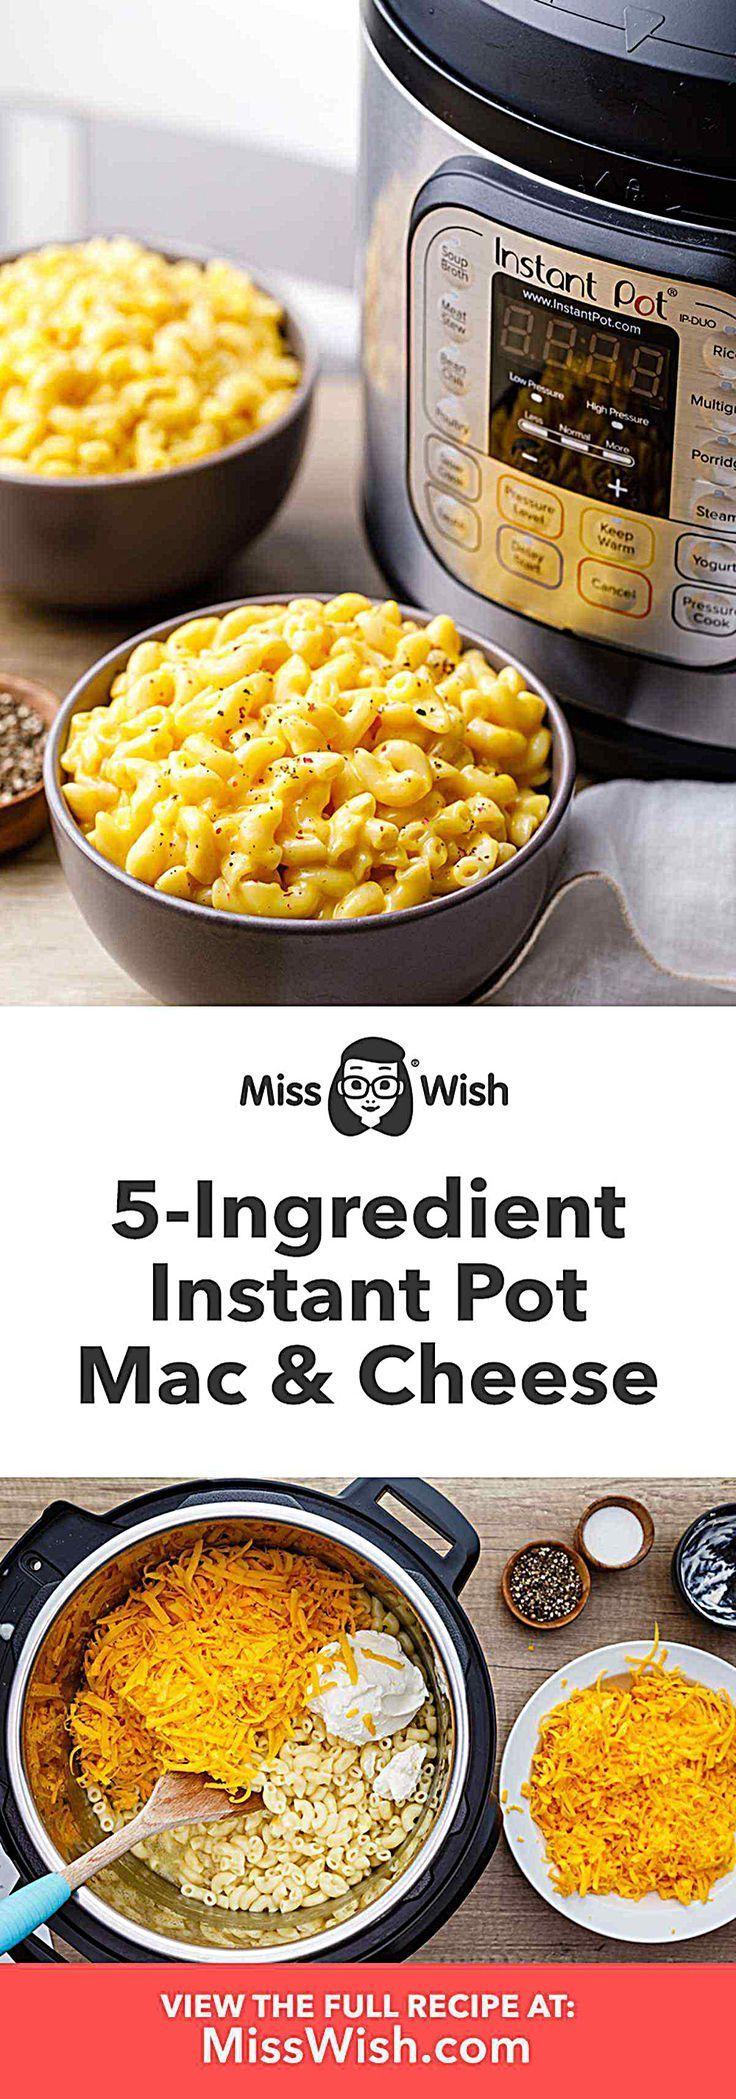 #5Ingredient #Cheese #Creamy #dinne #Easy #Instant #Mac